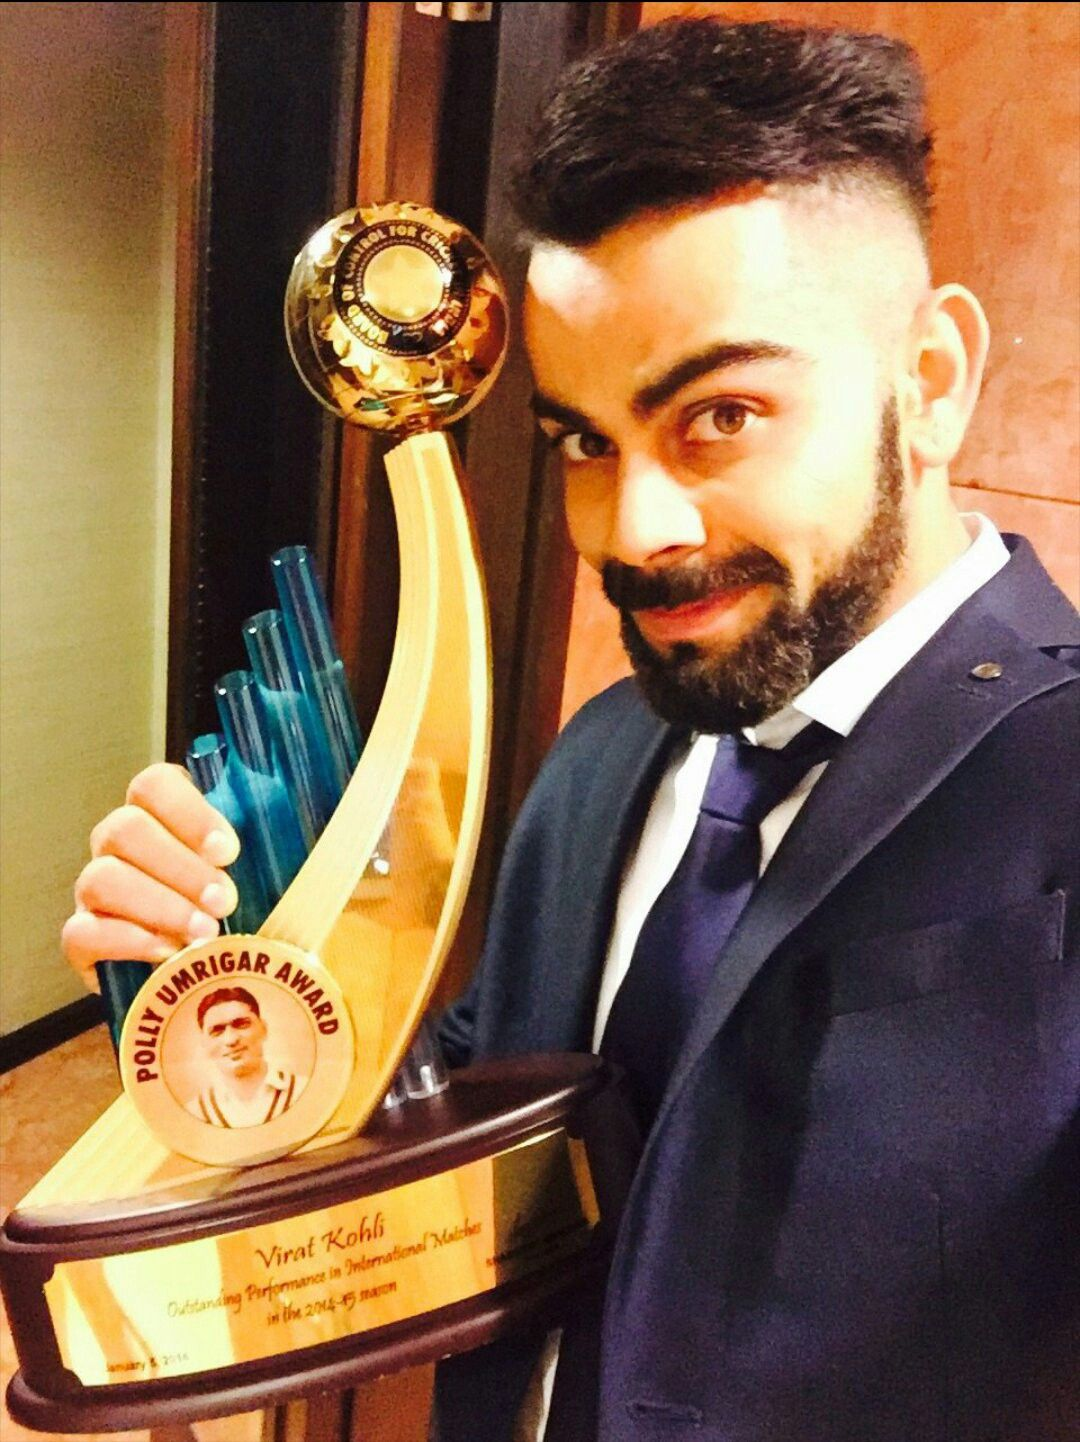 virat kohli was awarded with prestigious polly umrigar award 2016